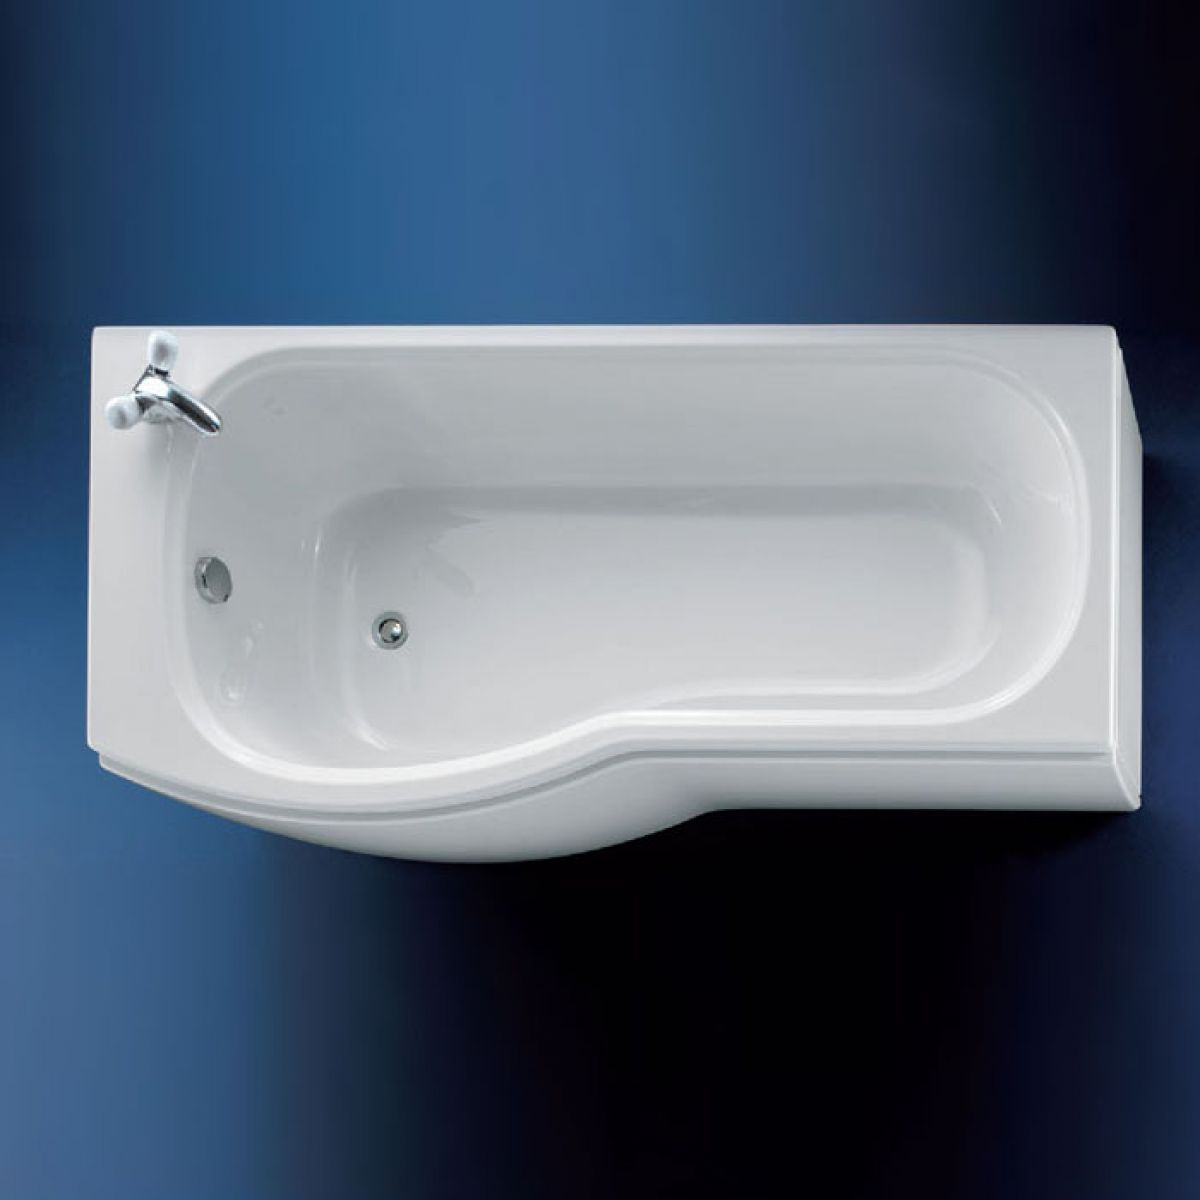 ideal standard alto shower bath uk bathrooms